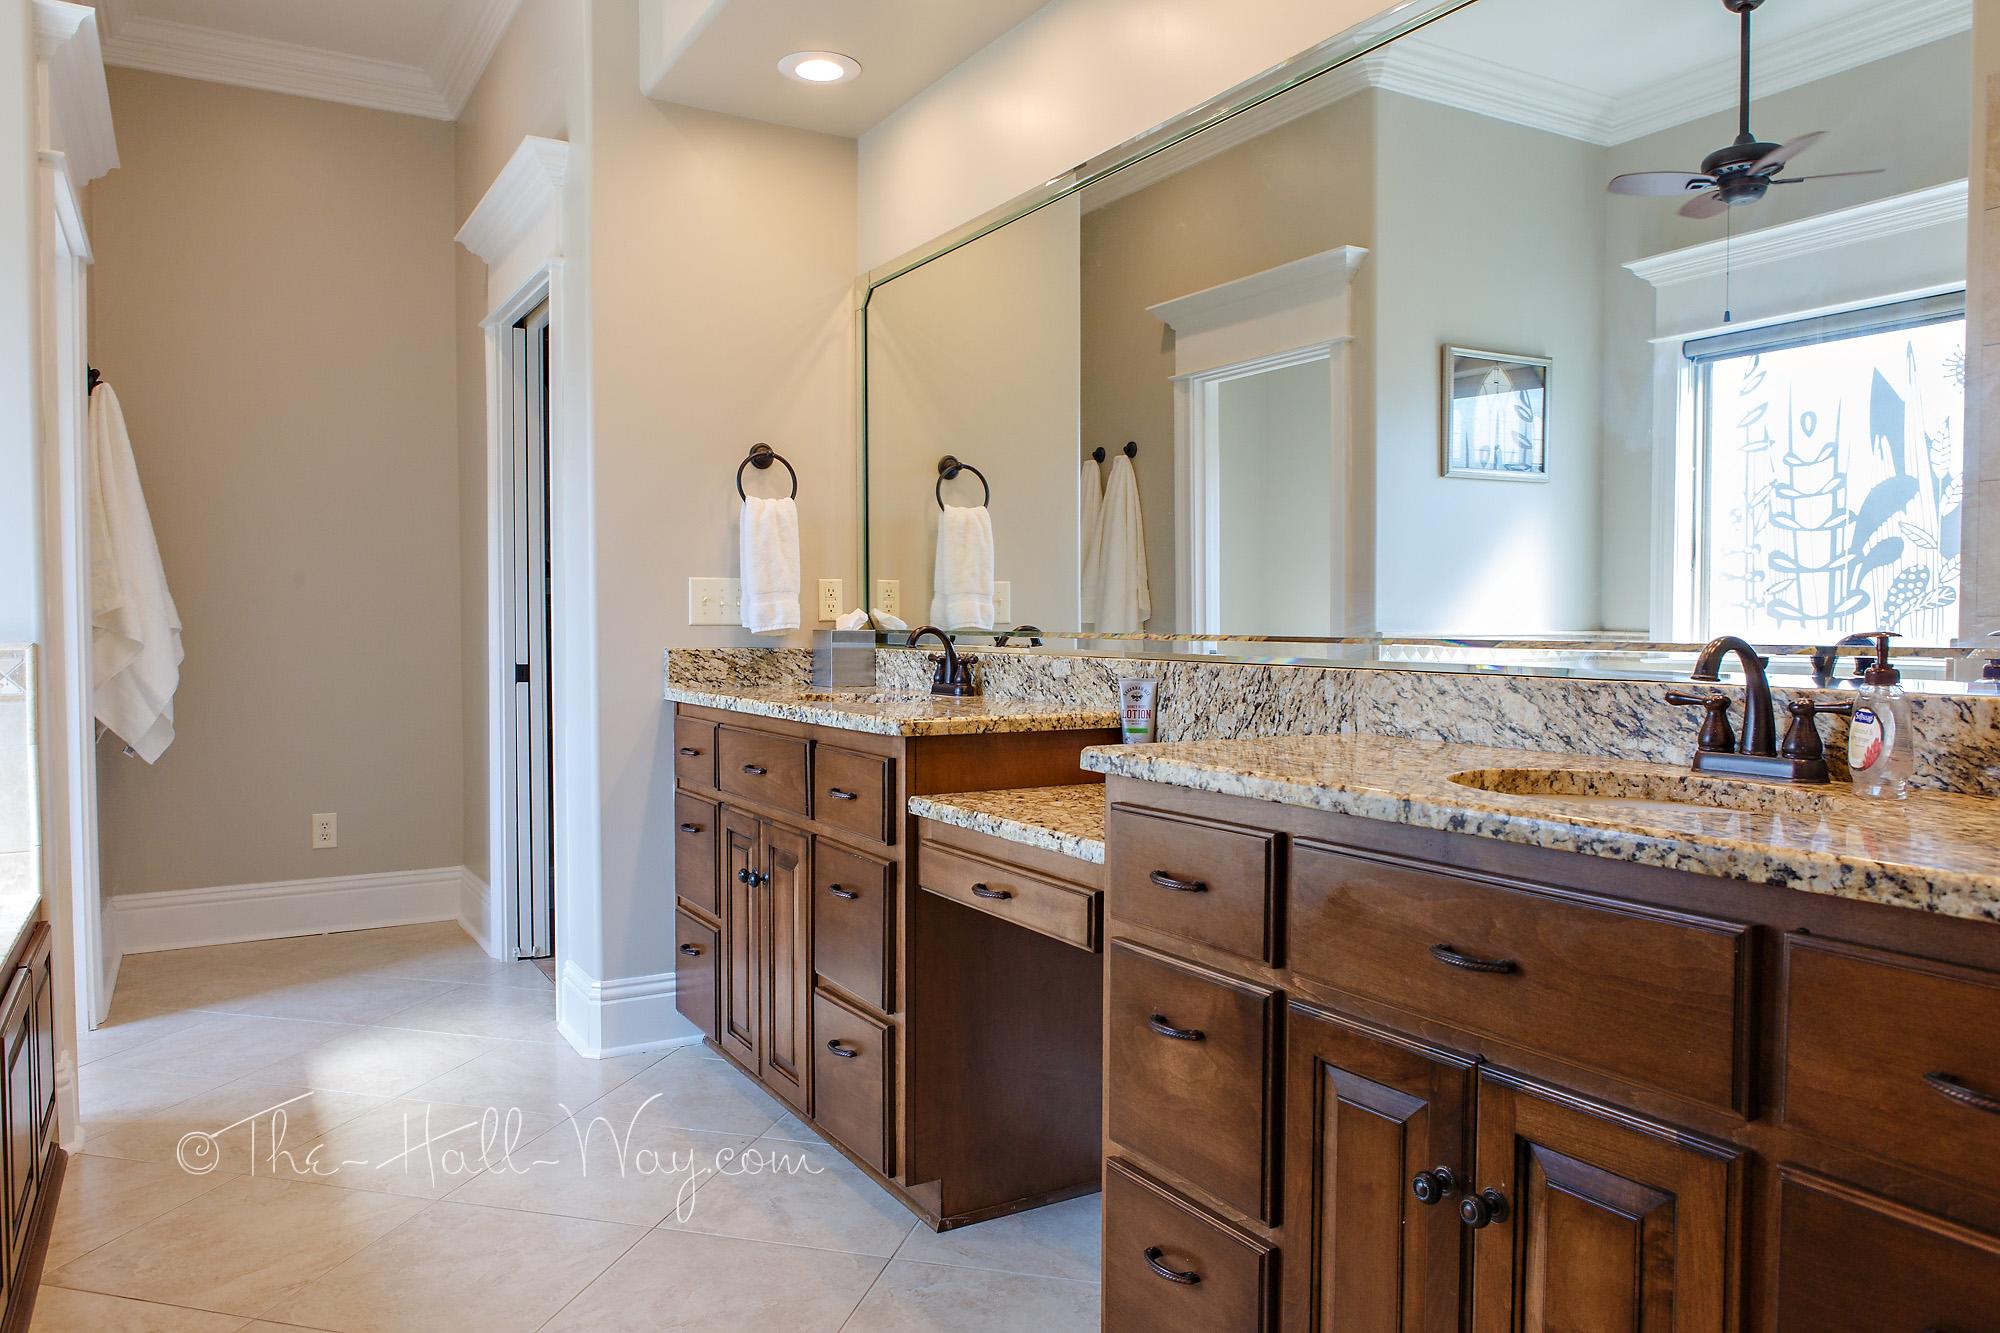 Master Bathroom Refresh The Hall Way - Bathroom refresh ideas